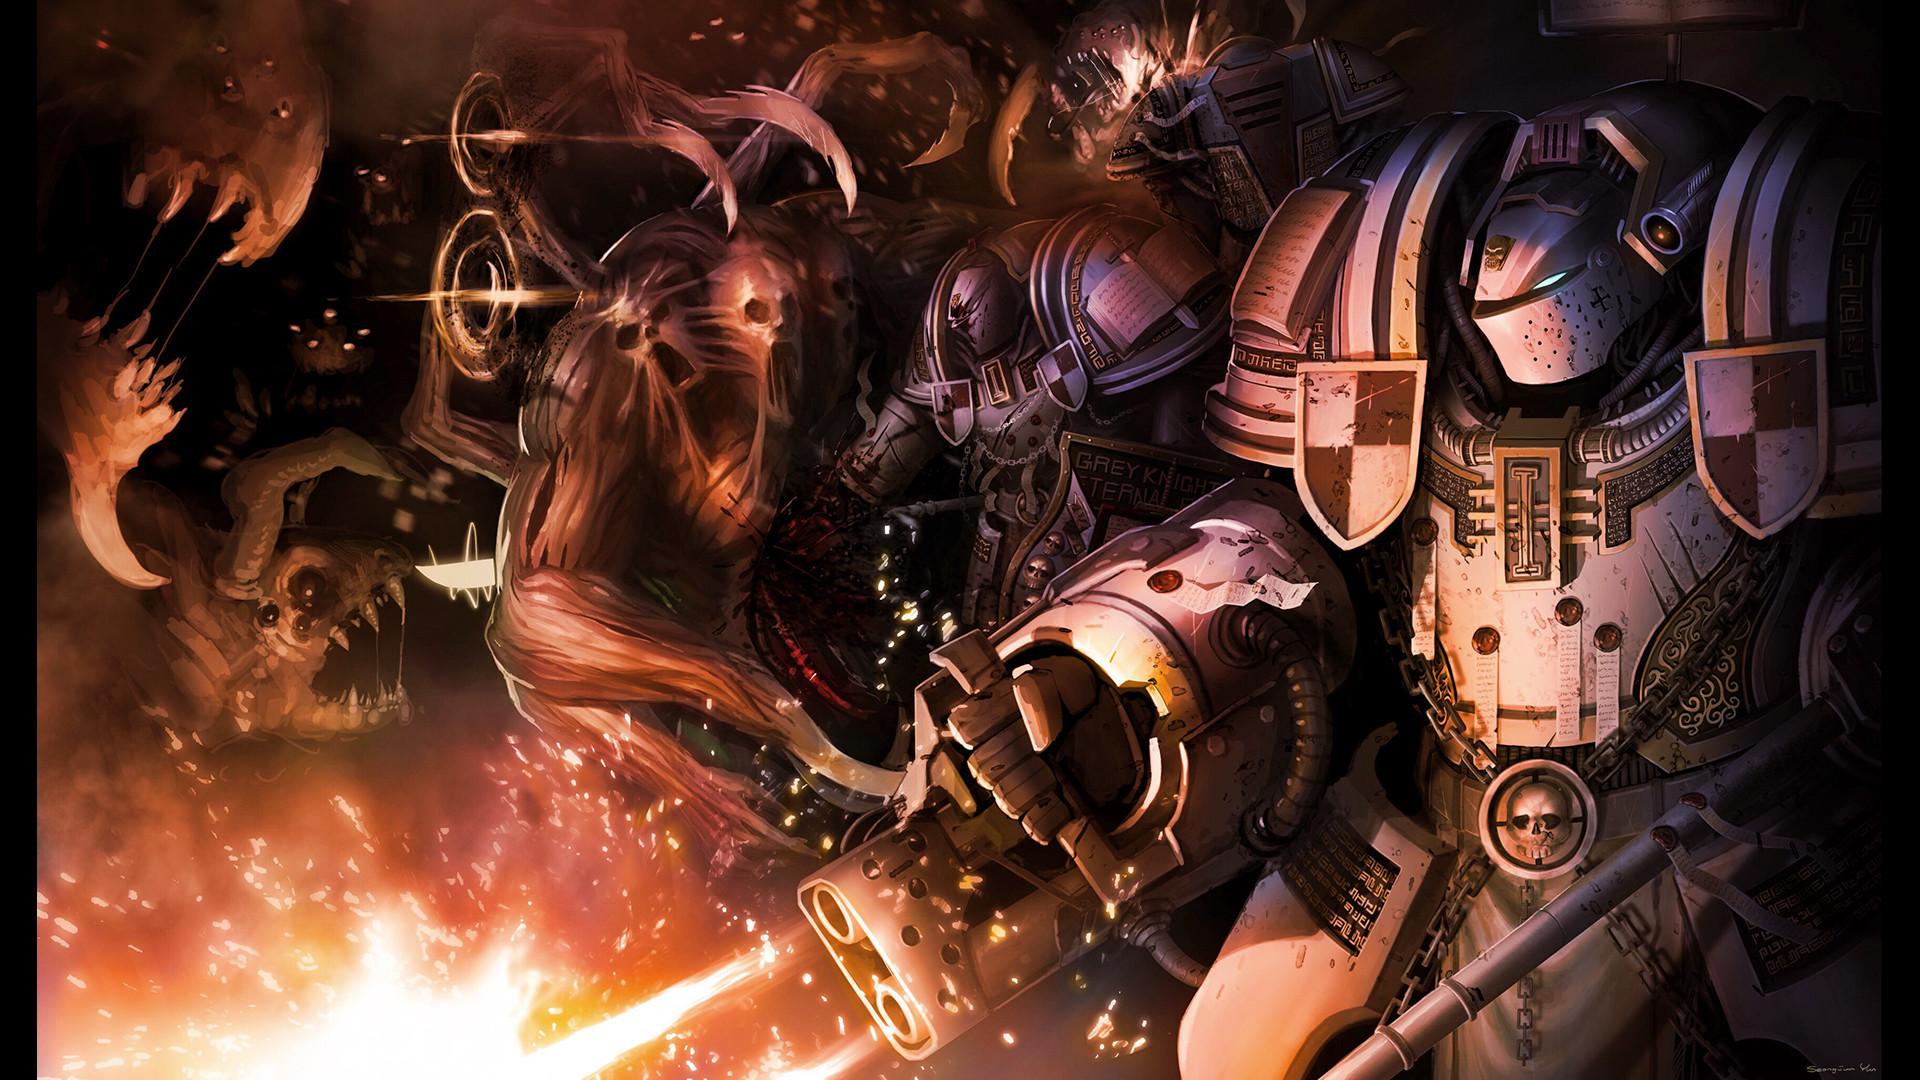 [Digital Painting] Warhammer 40K Grey Knights.